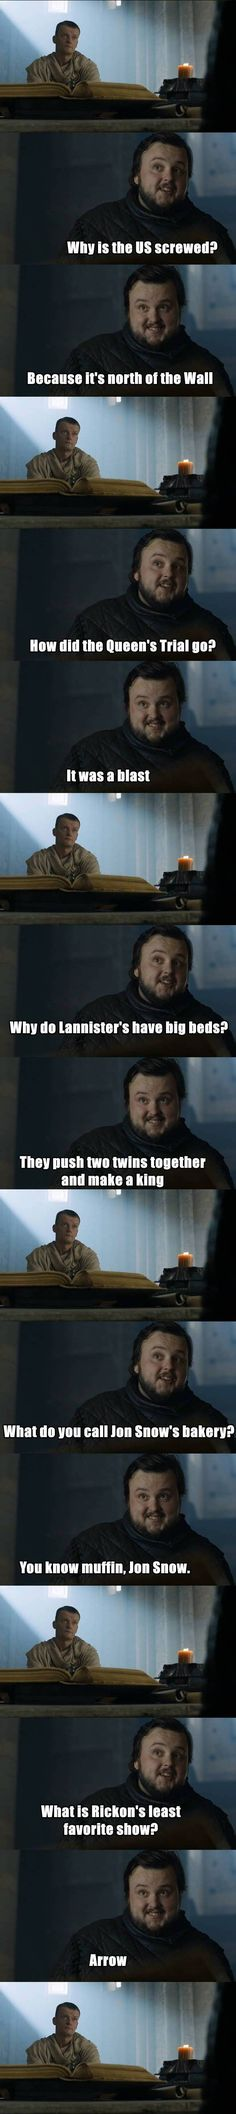 sam-citadel-memes 2. Game of thrones funny humour meme. Samwell Tarly